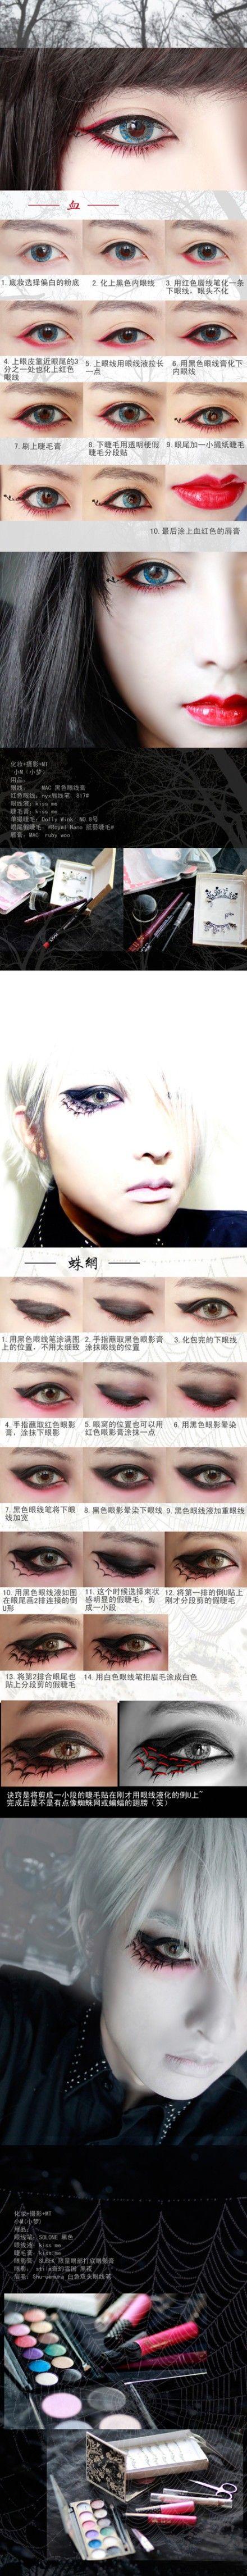 maquillaje lolita gotic                                                         ...